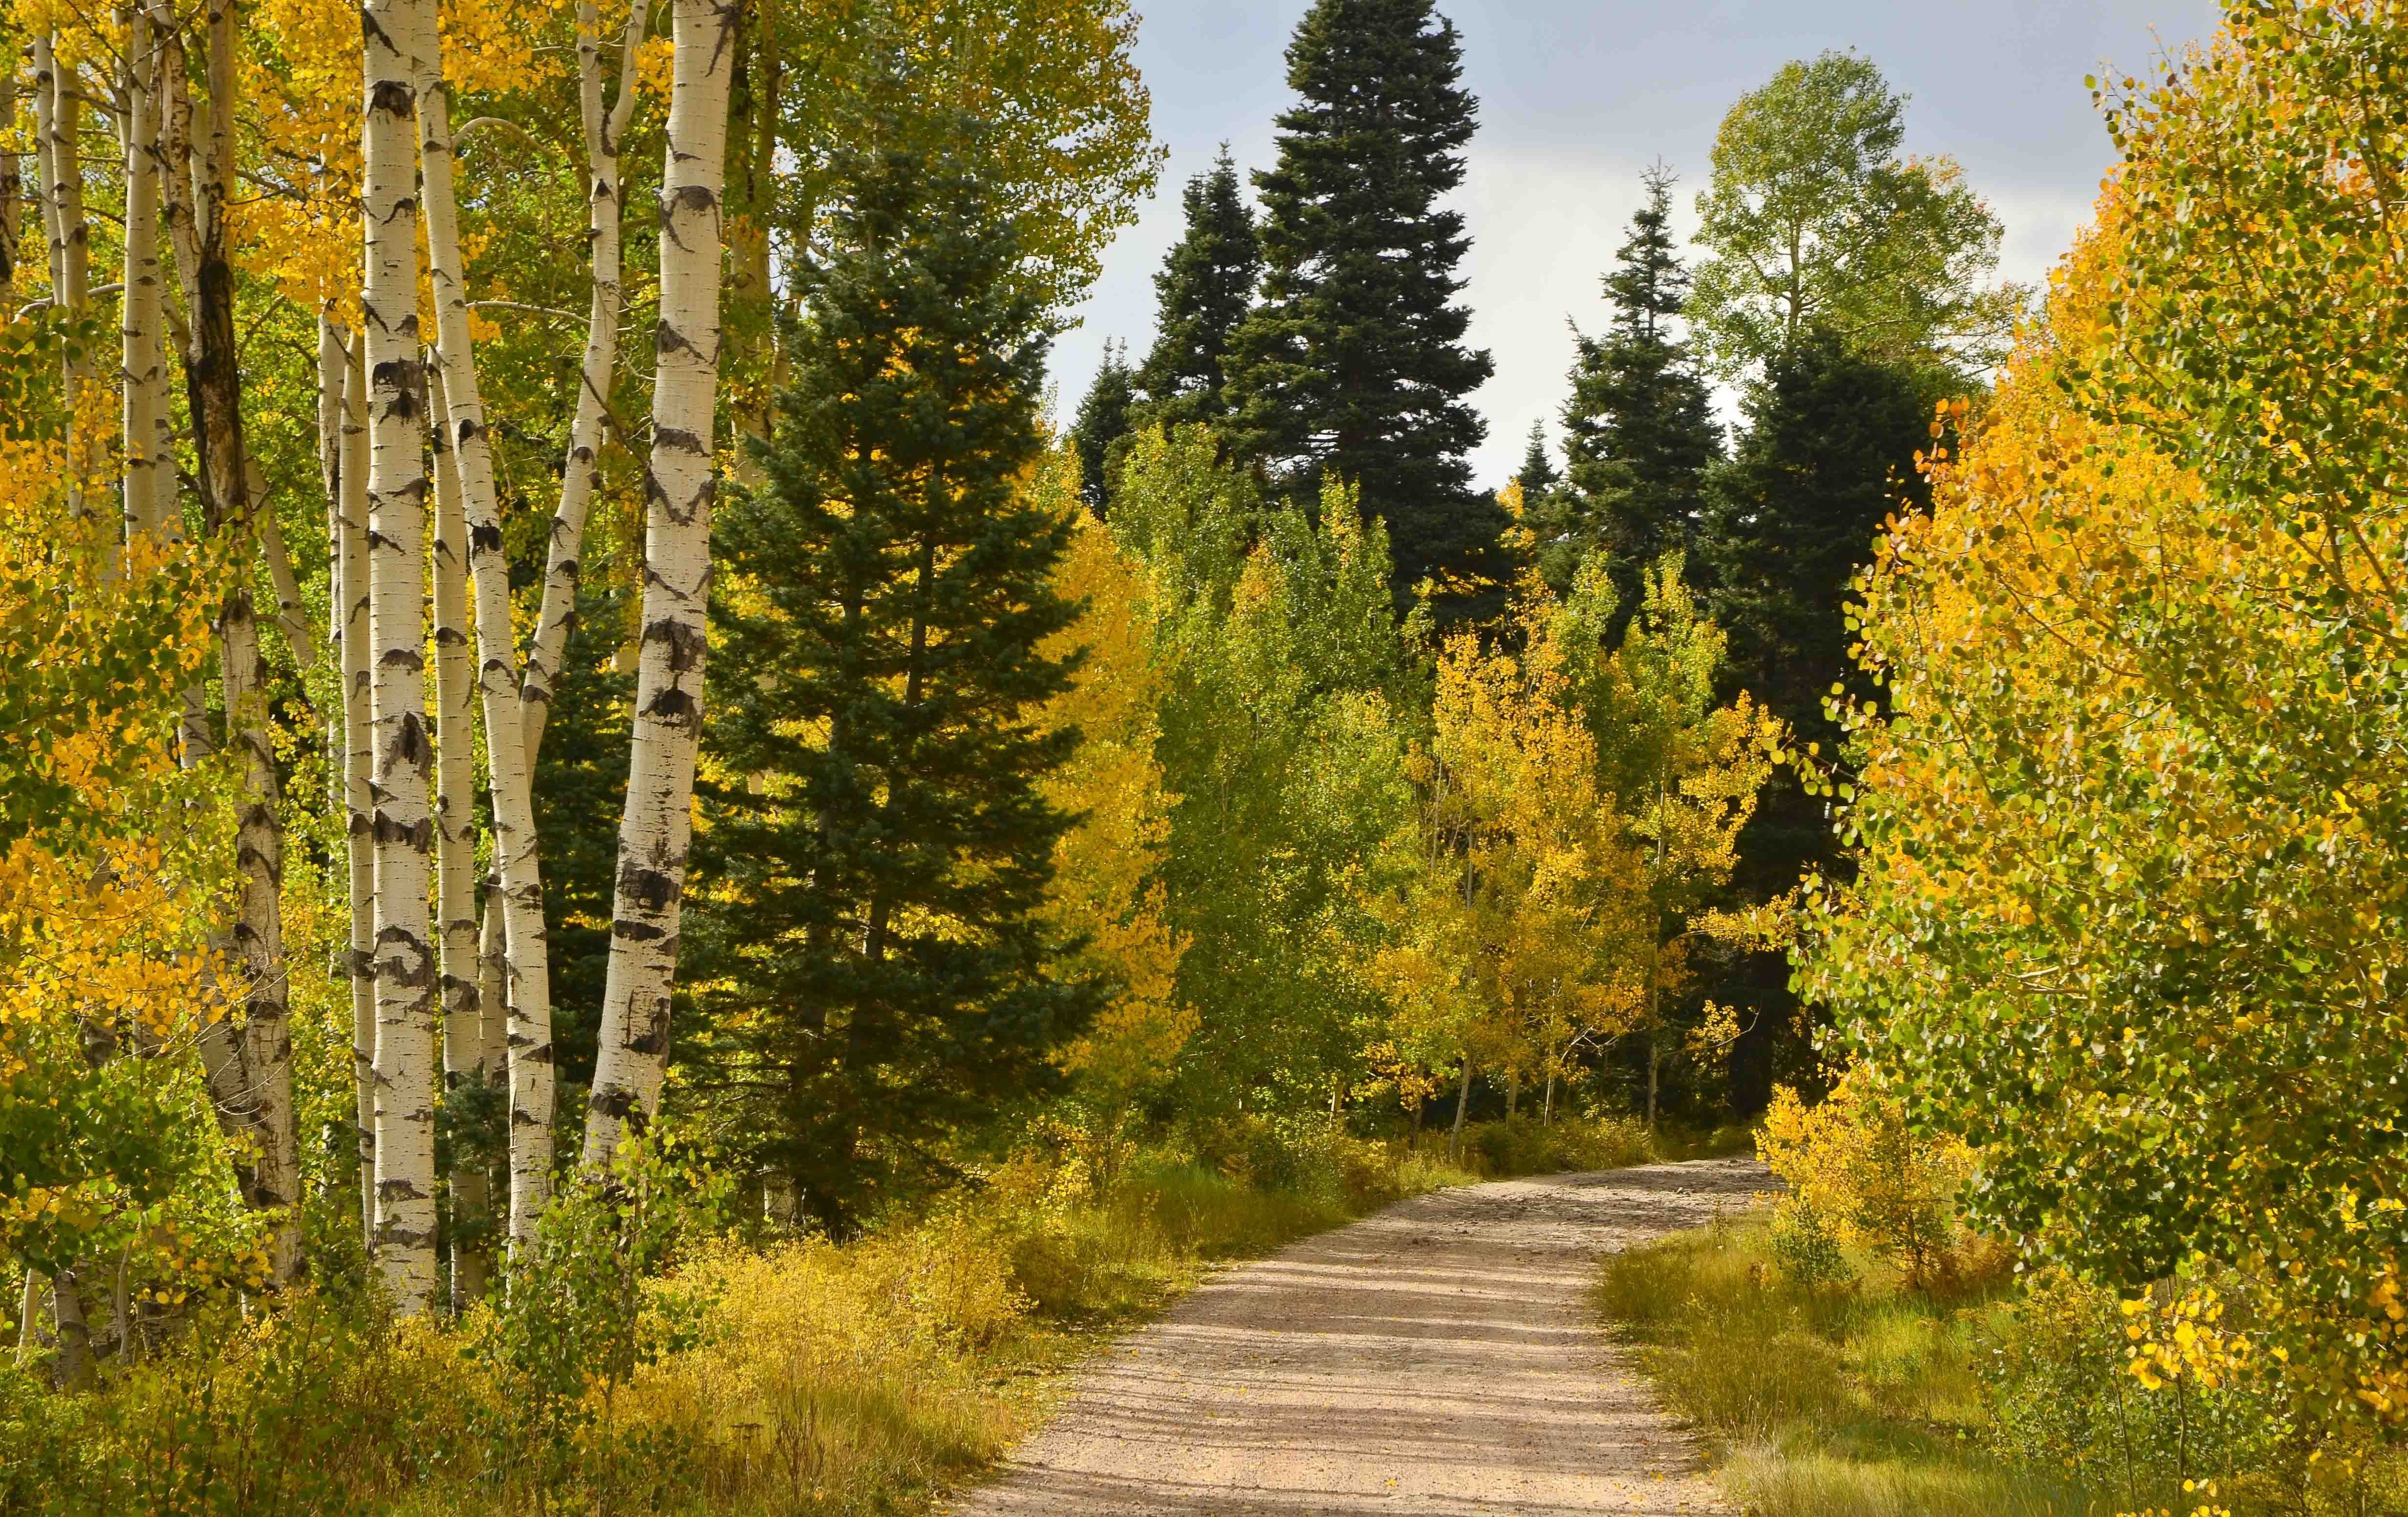 Картинки ранняя осень сентябрь, пожеланием